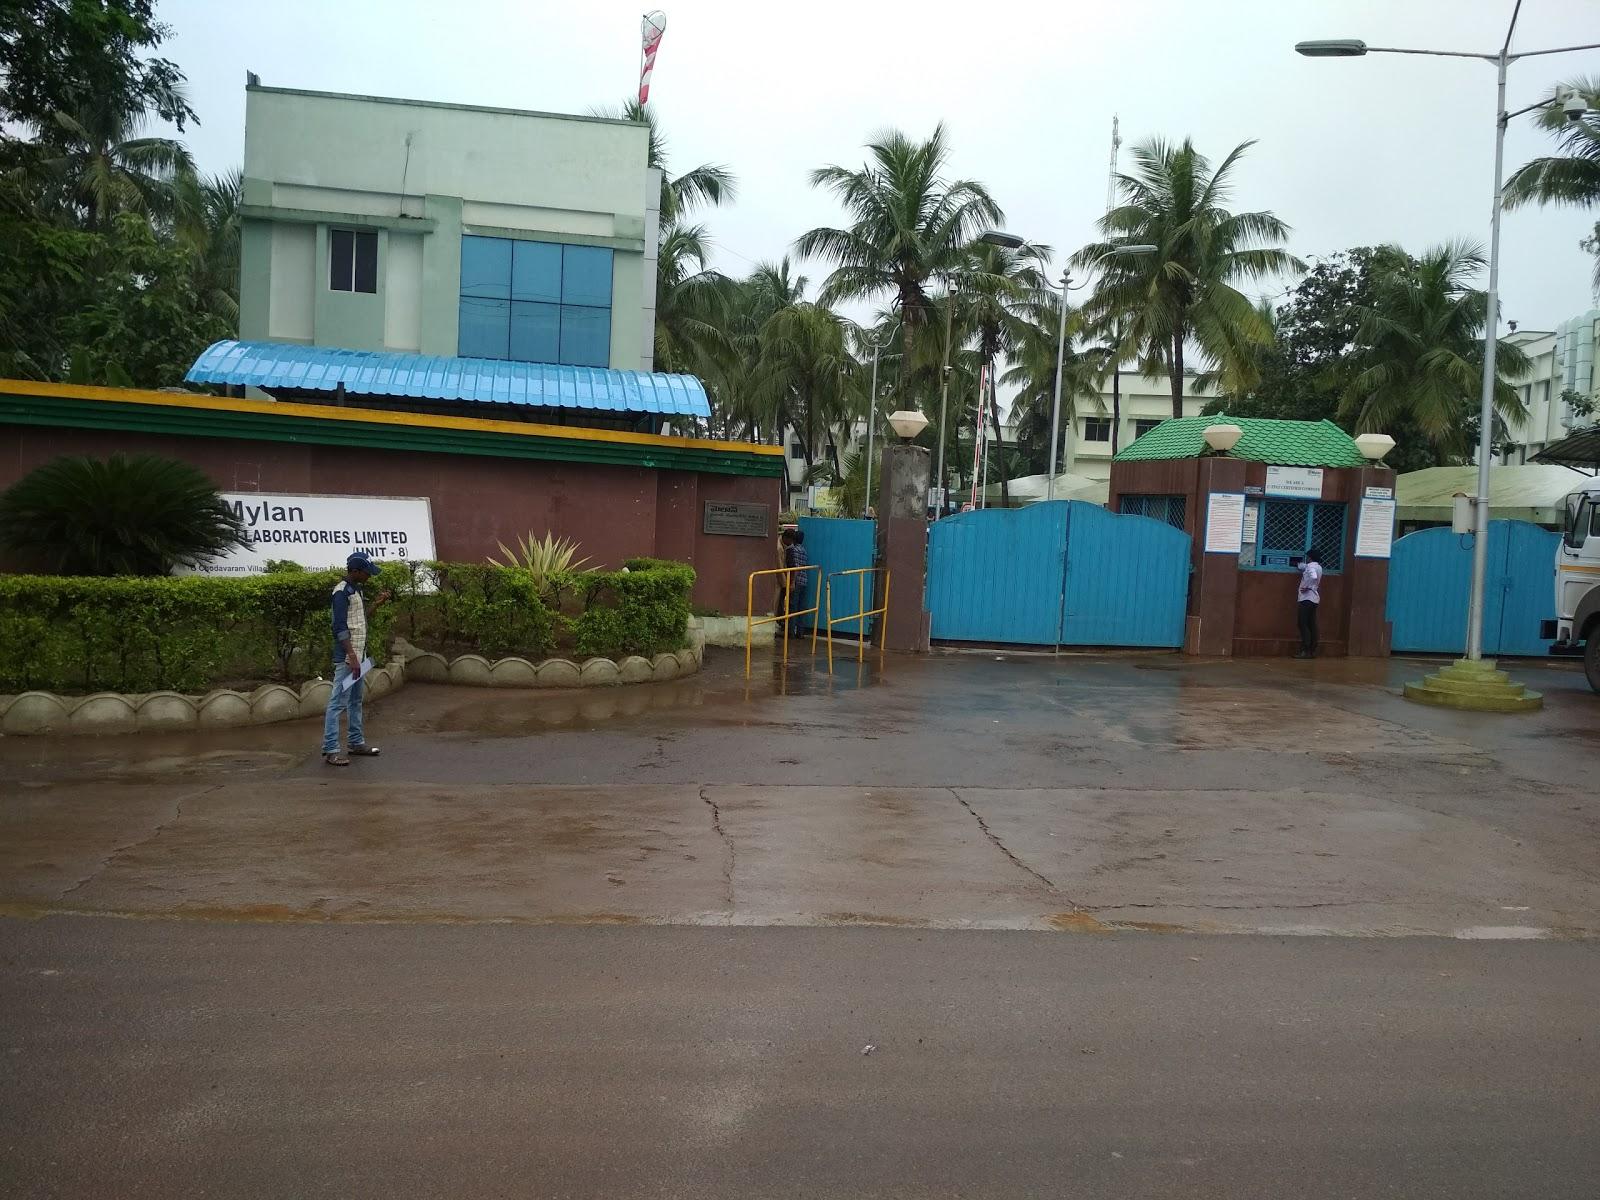 AIFA. Verifica Officina Farmaceutica: Mylan Unit 8 G Chodavaram – India